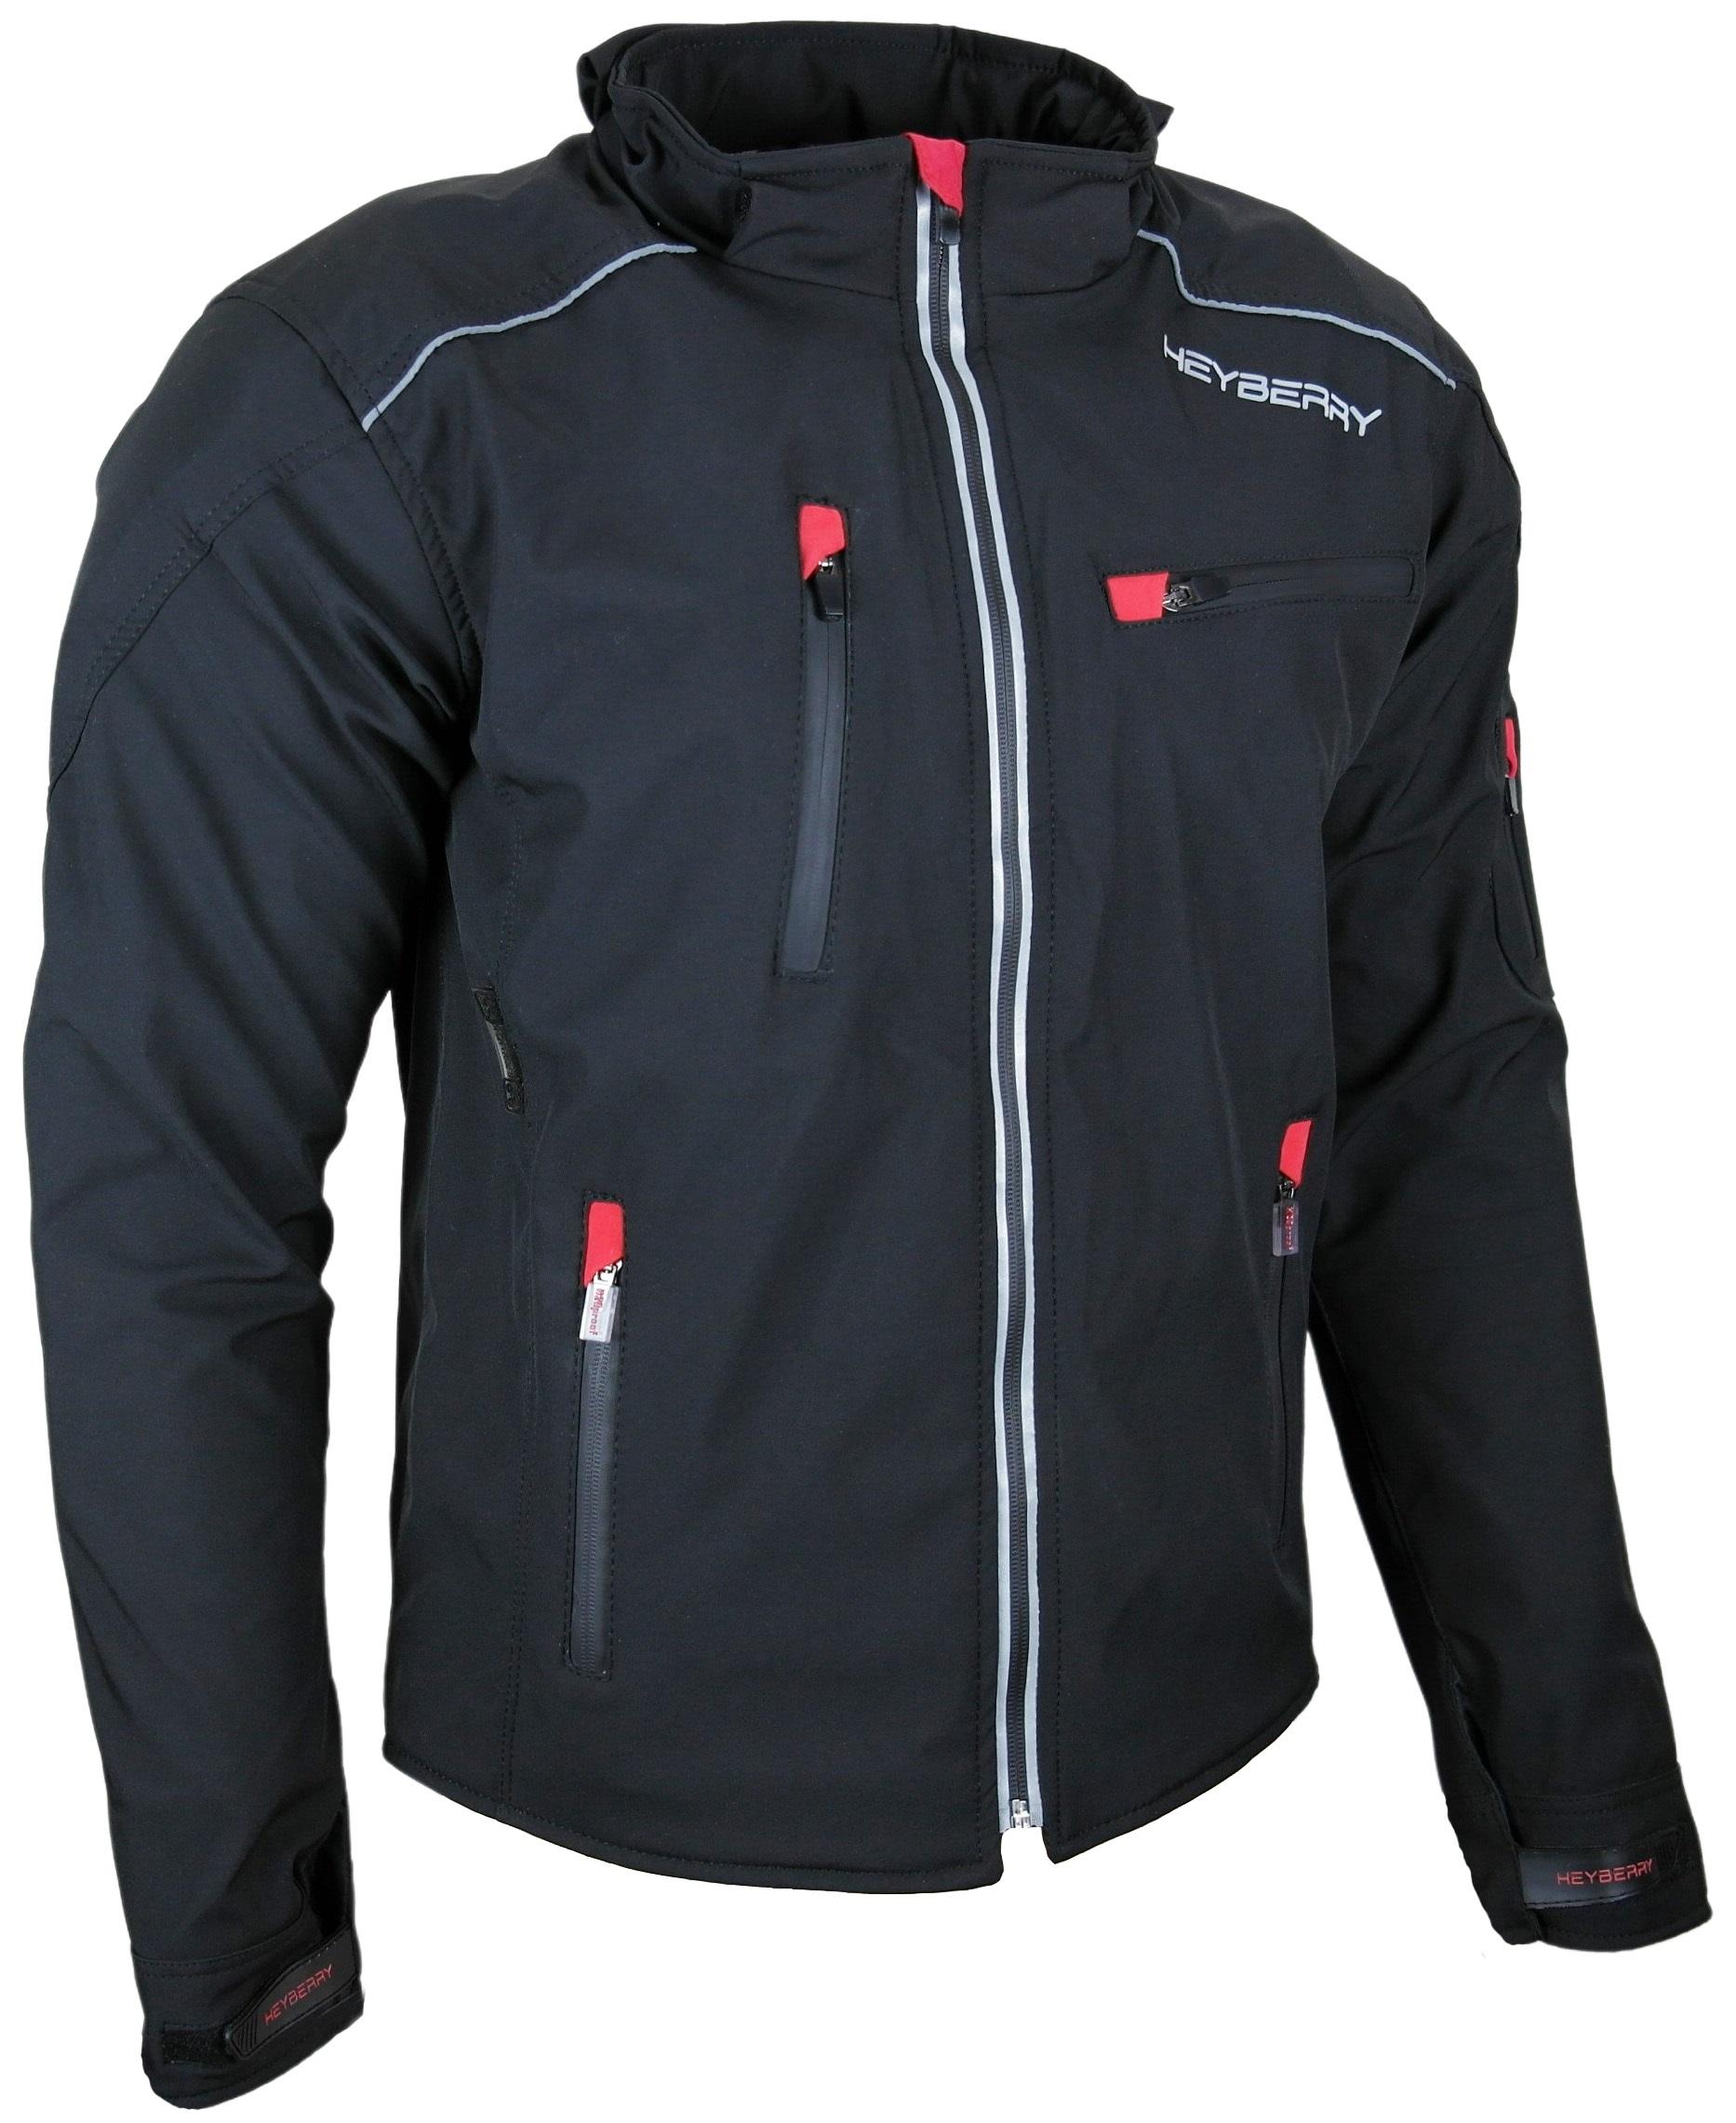 Heyberry Soft Shell Motorradjacke Textil Schwarz Gr. M - 7XL